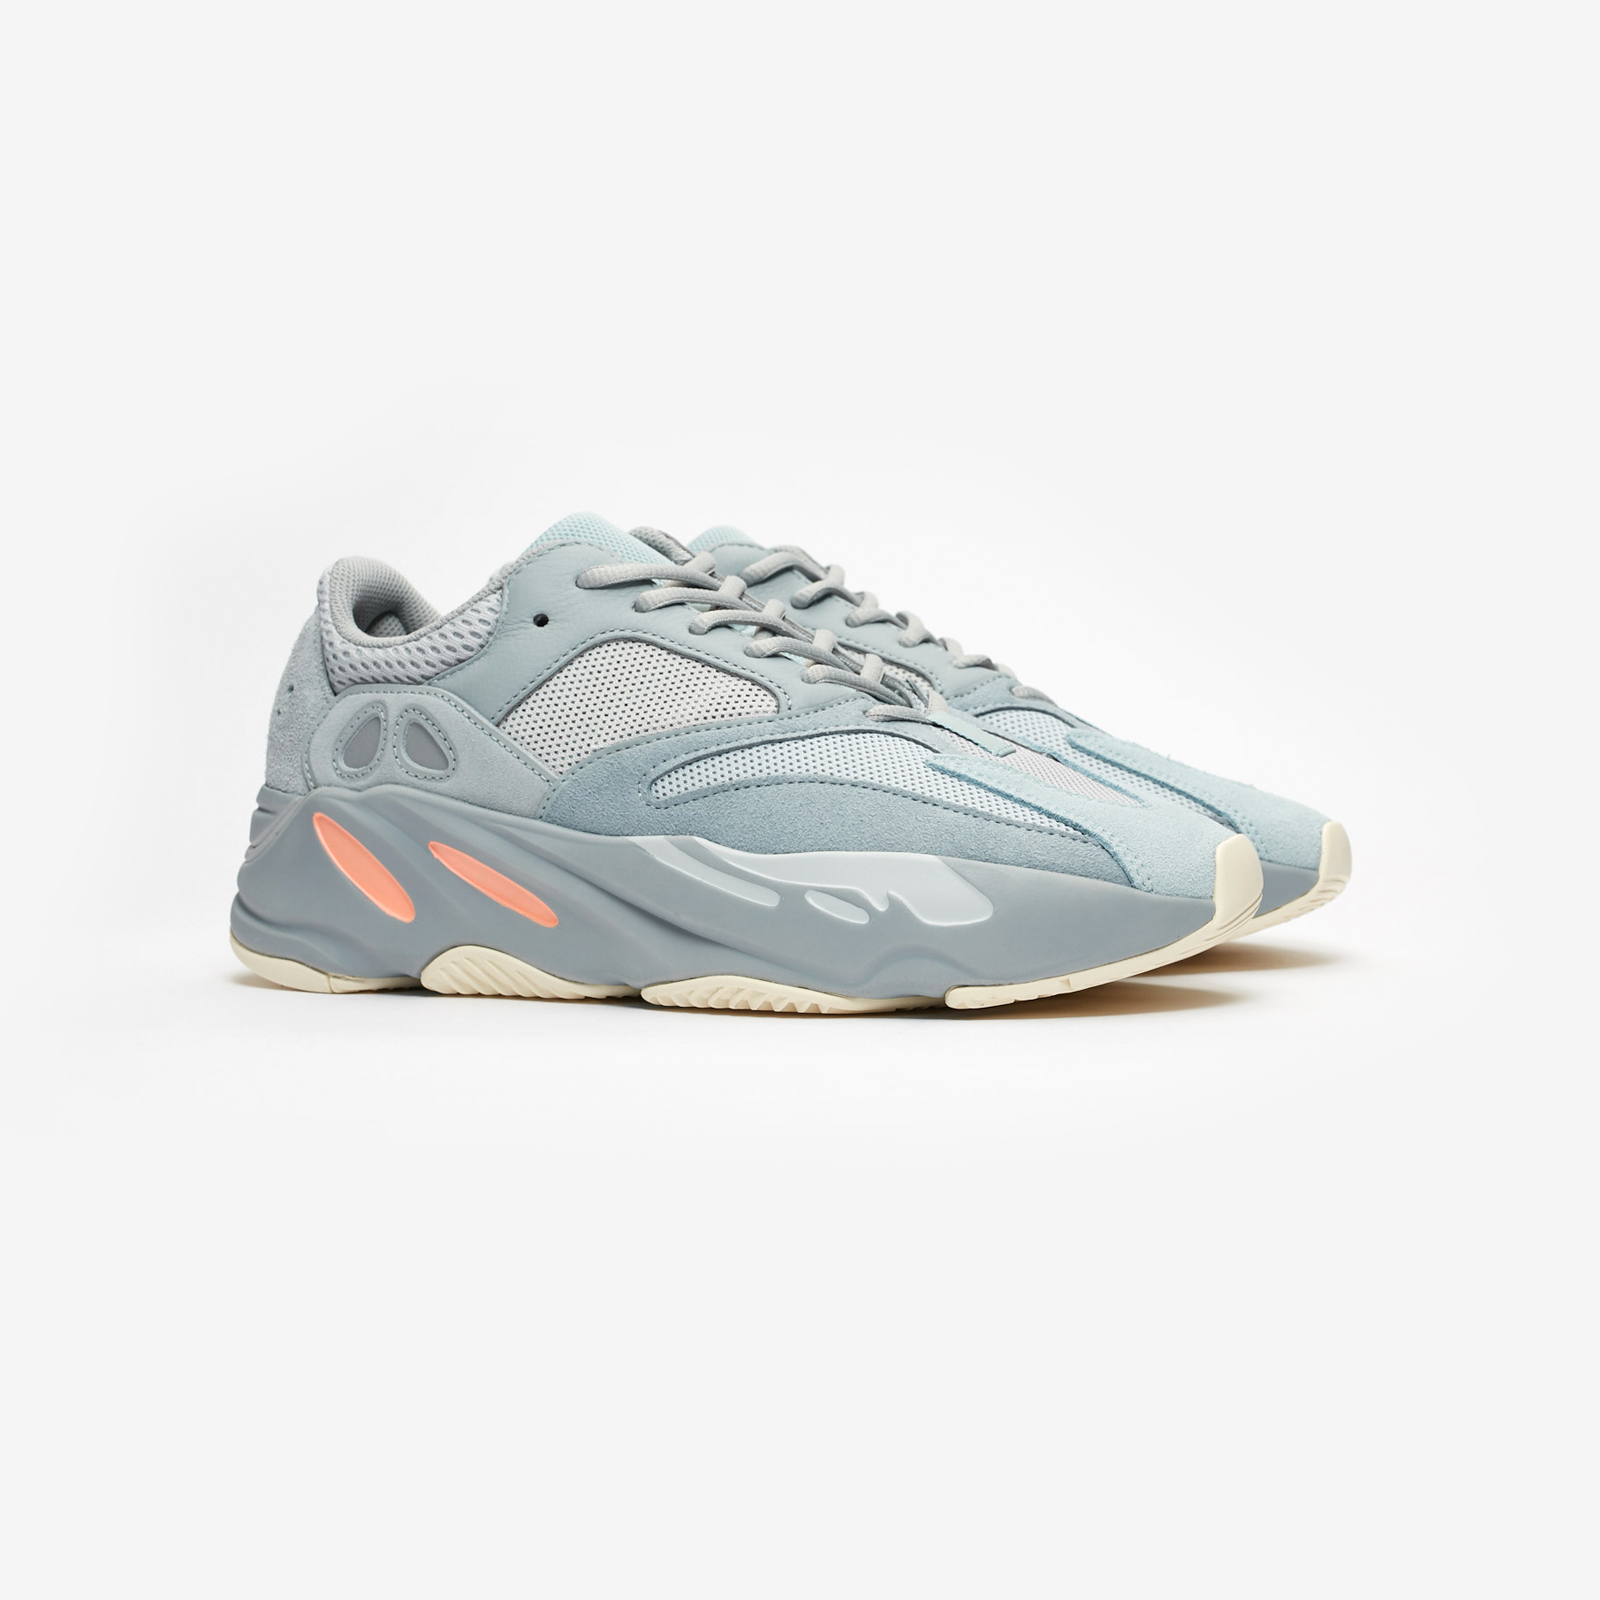 eaac8ab1f53 adidas Yeezy Boost 700 - Eg7597 - Sneakersnstuff